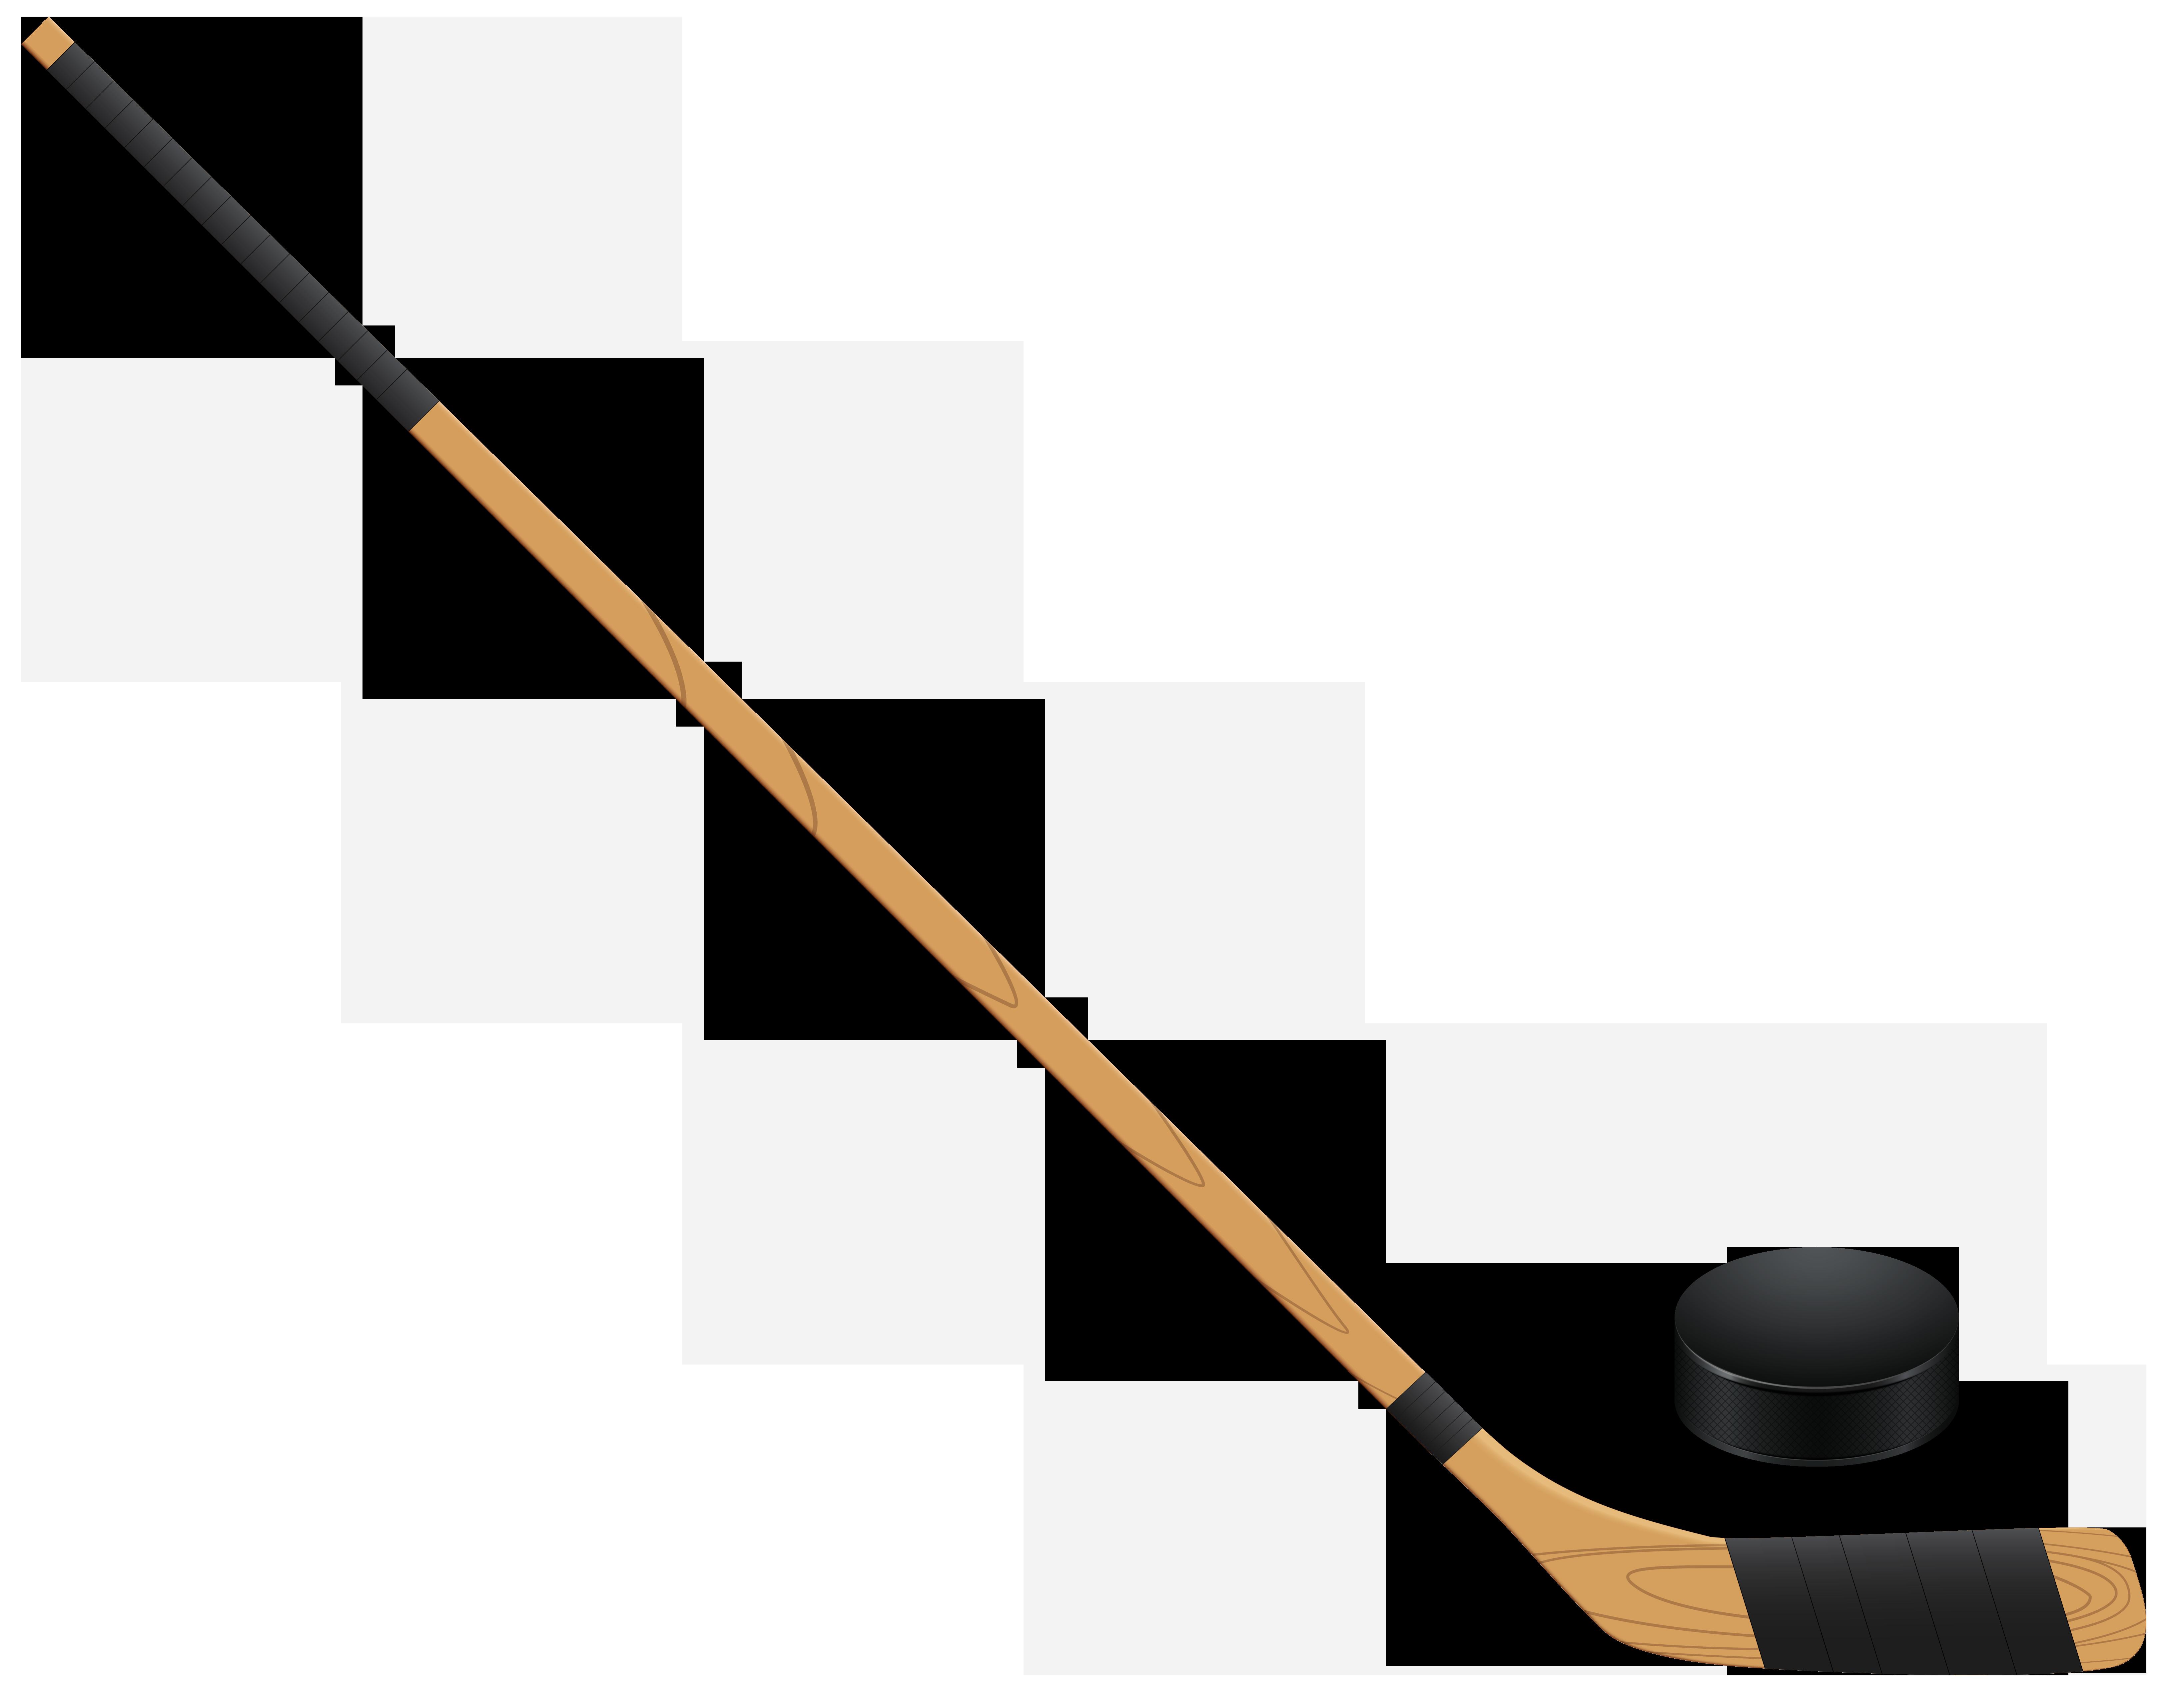 Hockey Stick Drawing